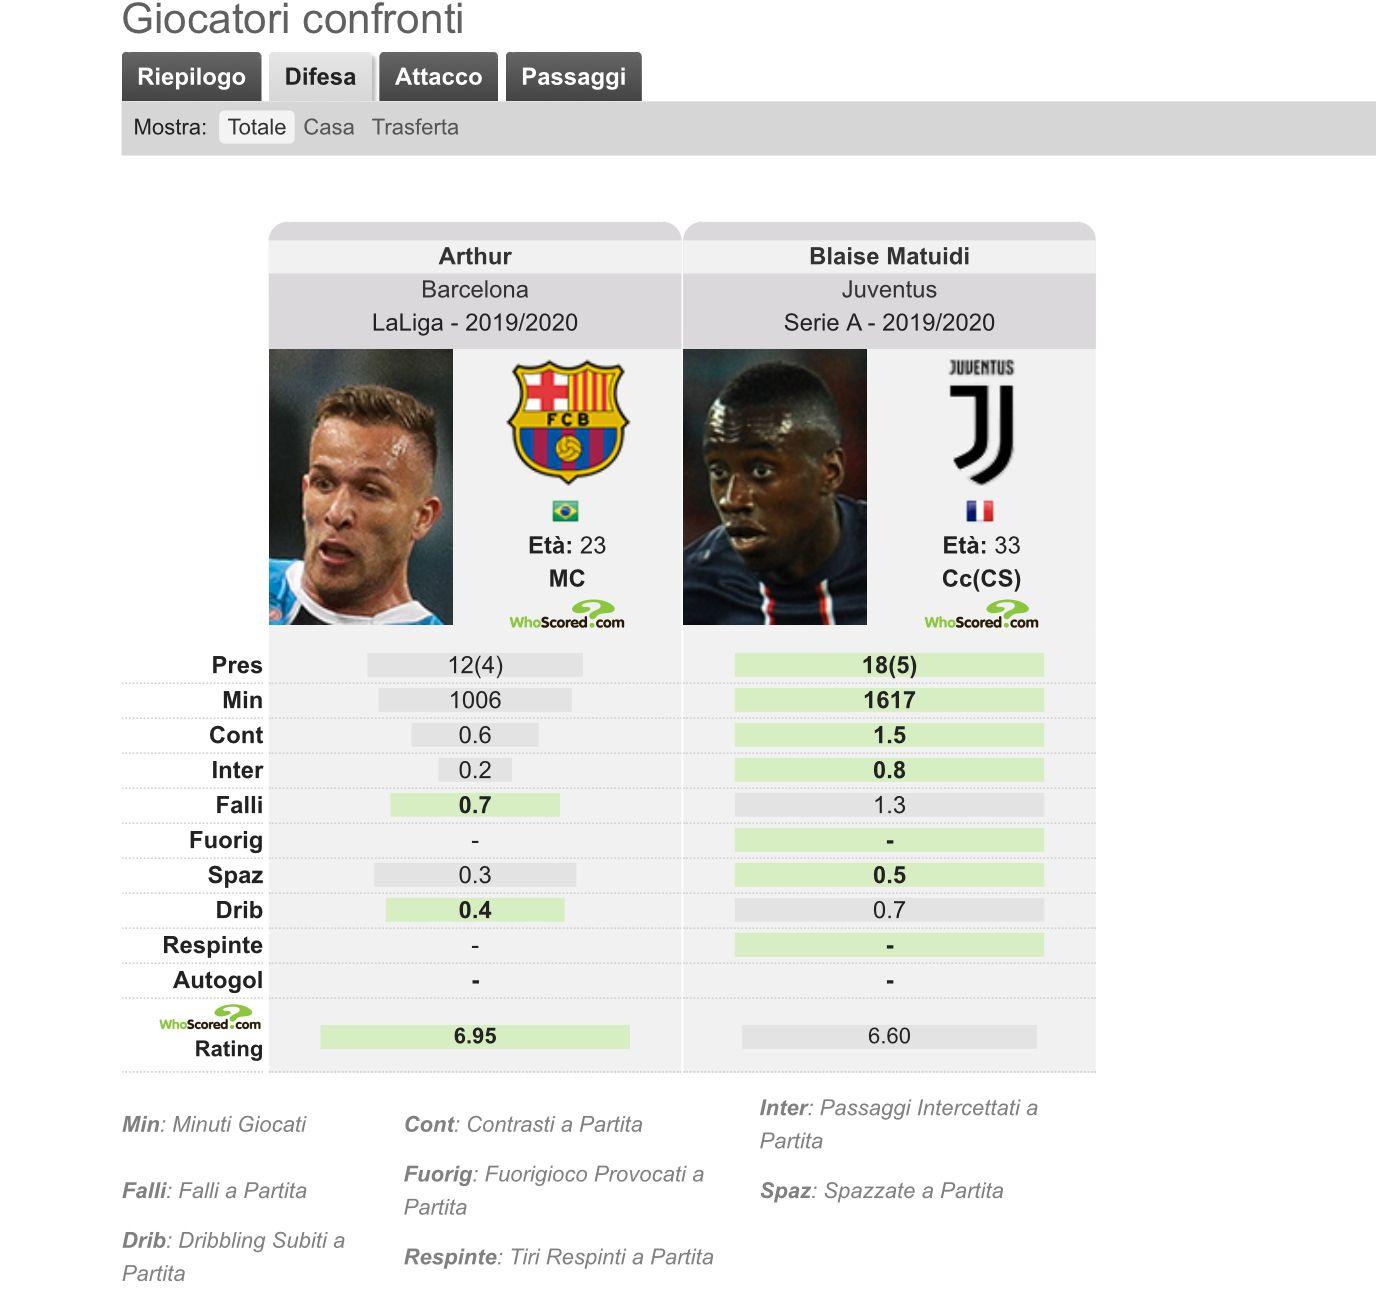 Arthur alla Juventus, Calciomercato: catalani disposto a trattare?